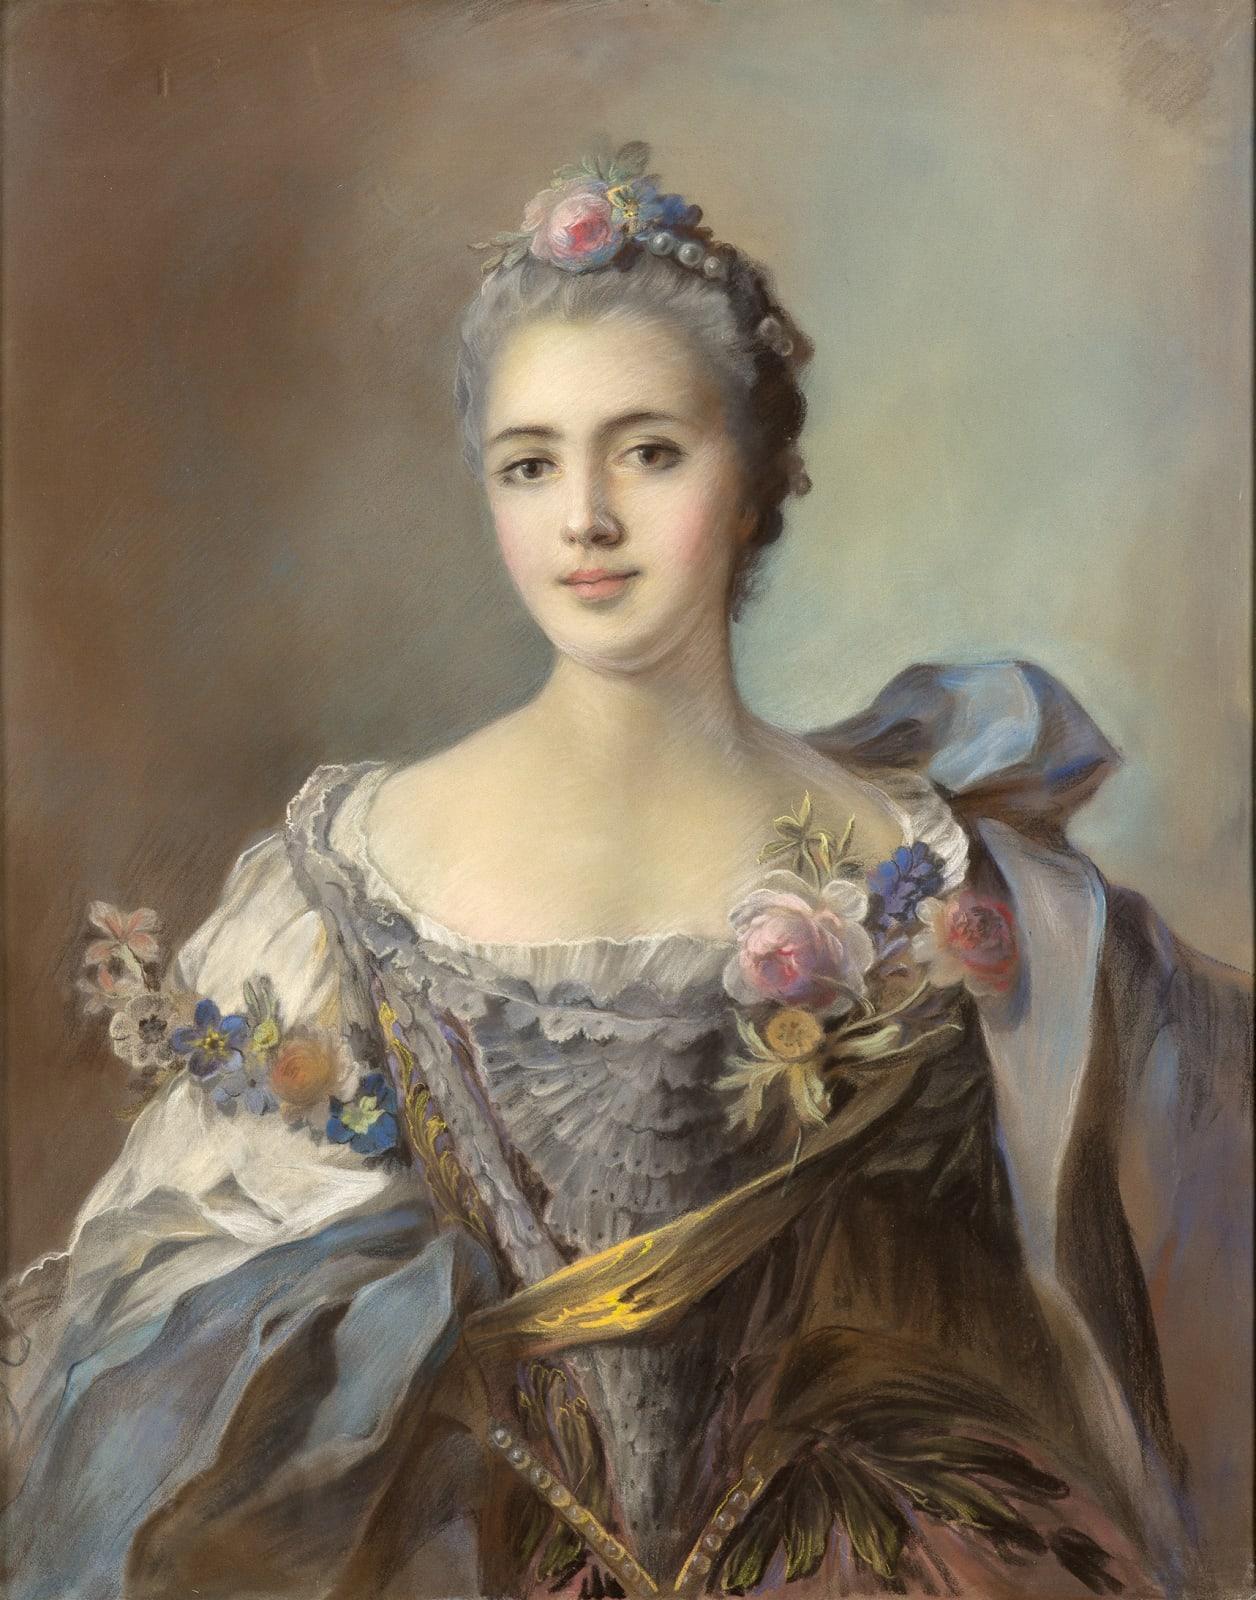 Jean-Marc Nattier La Duchesse d'Estissac, 1742